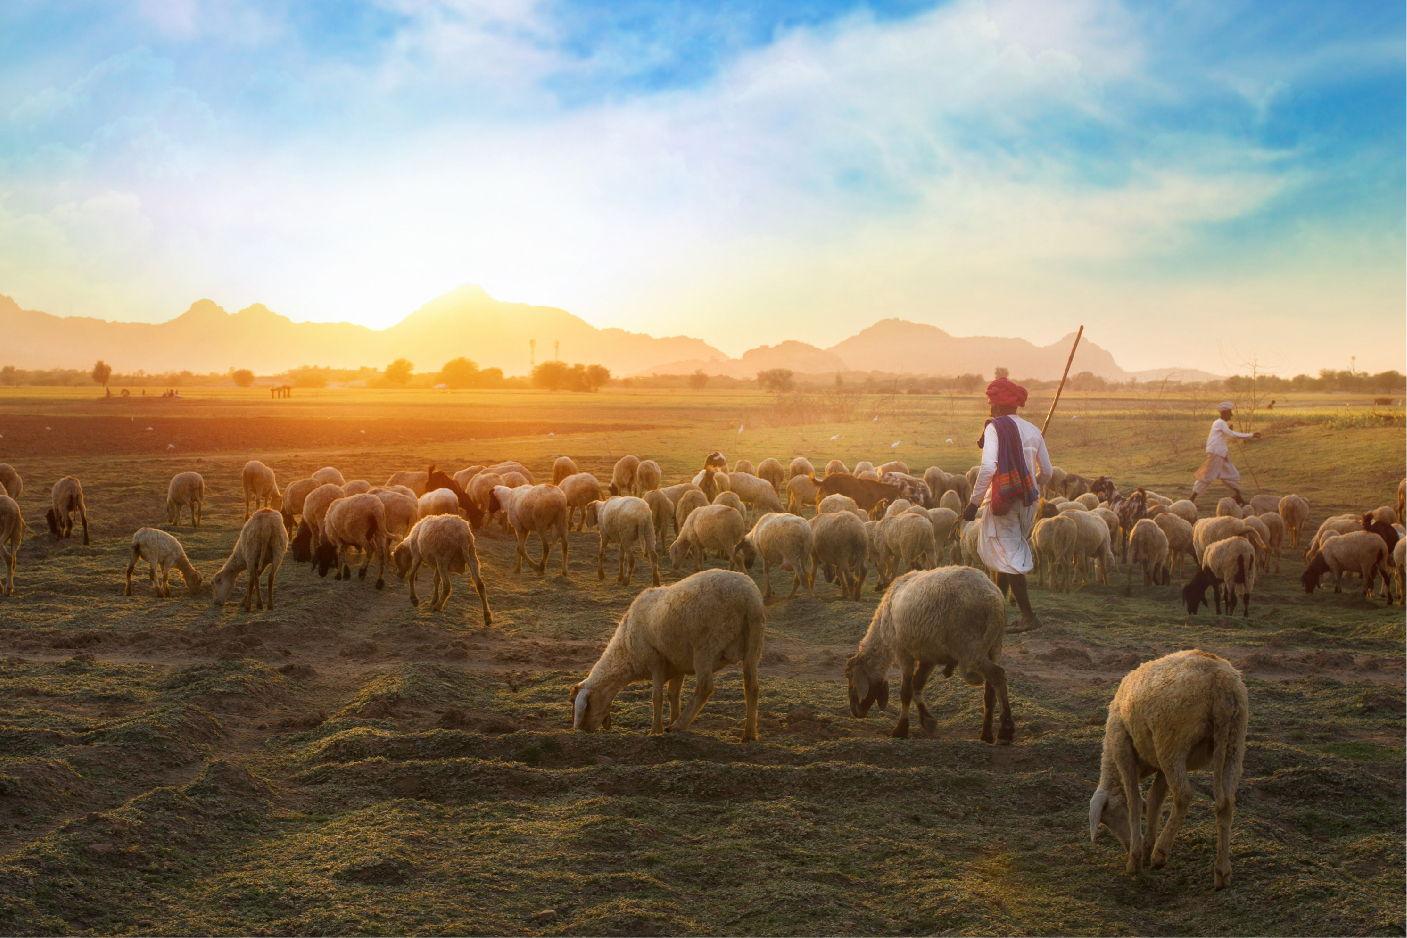 Drought impacts I: migration